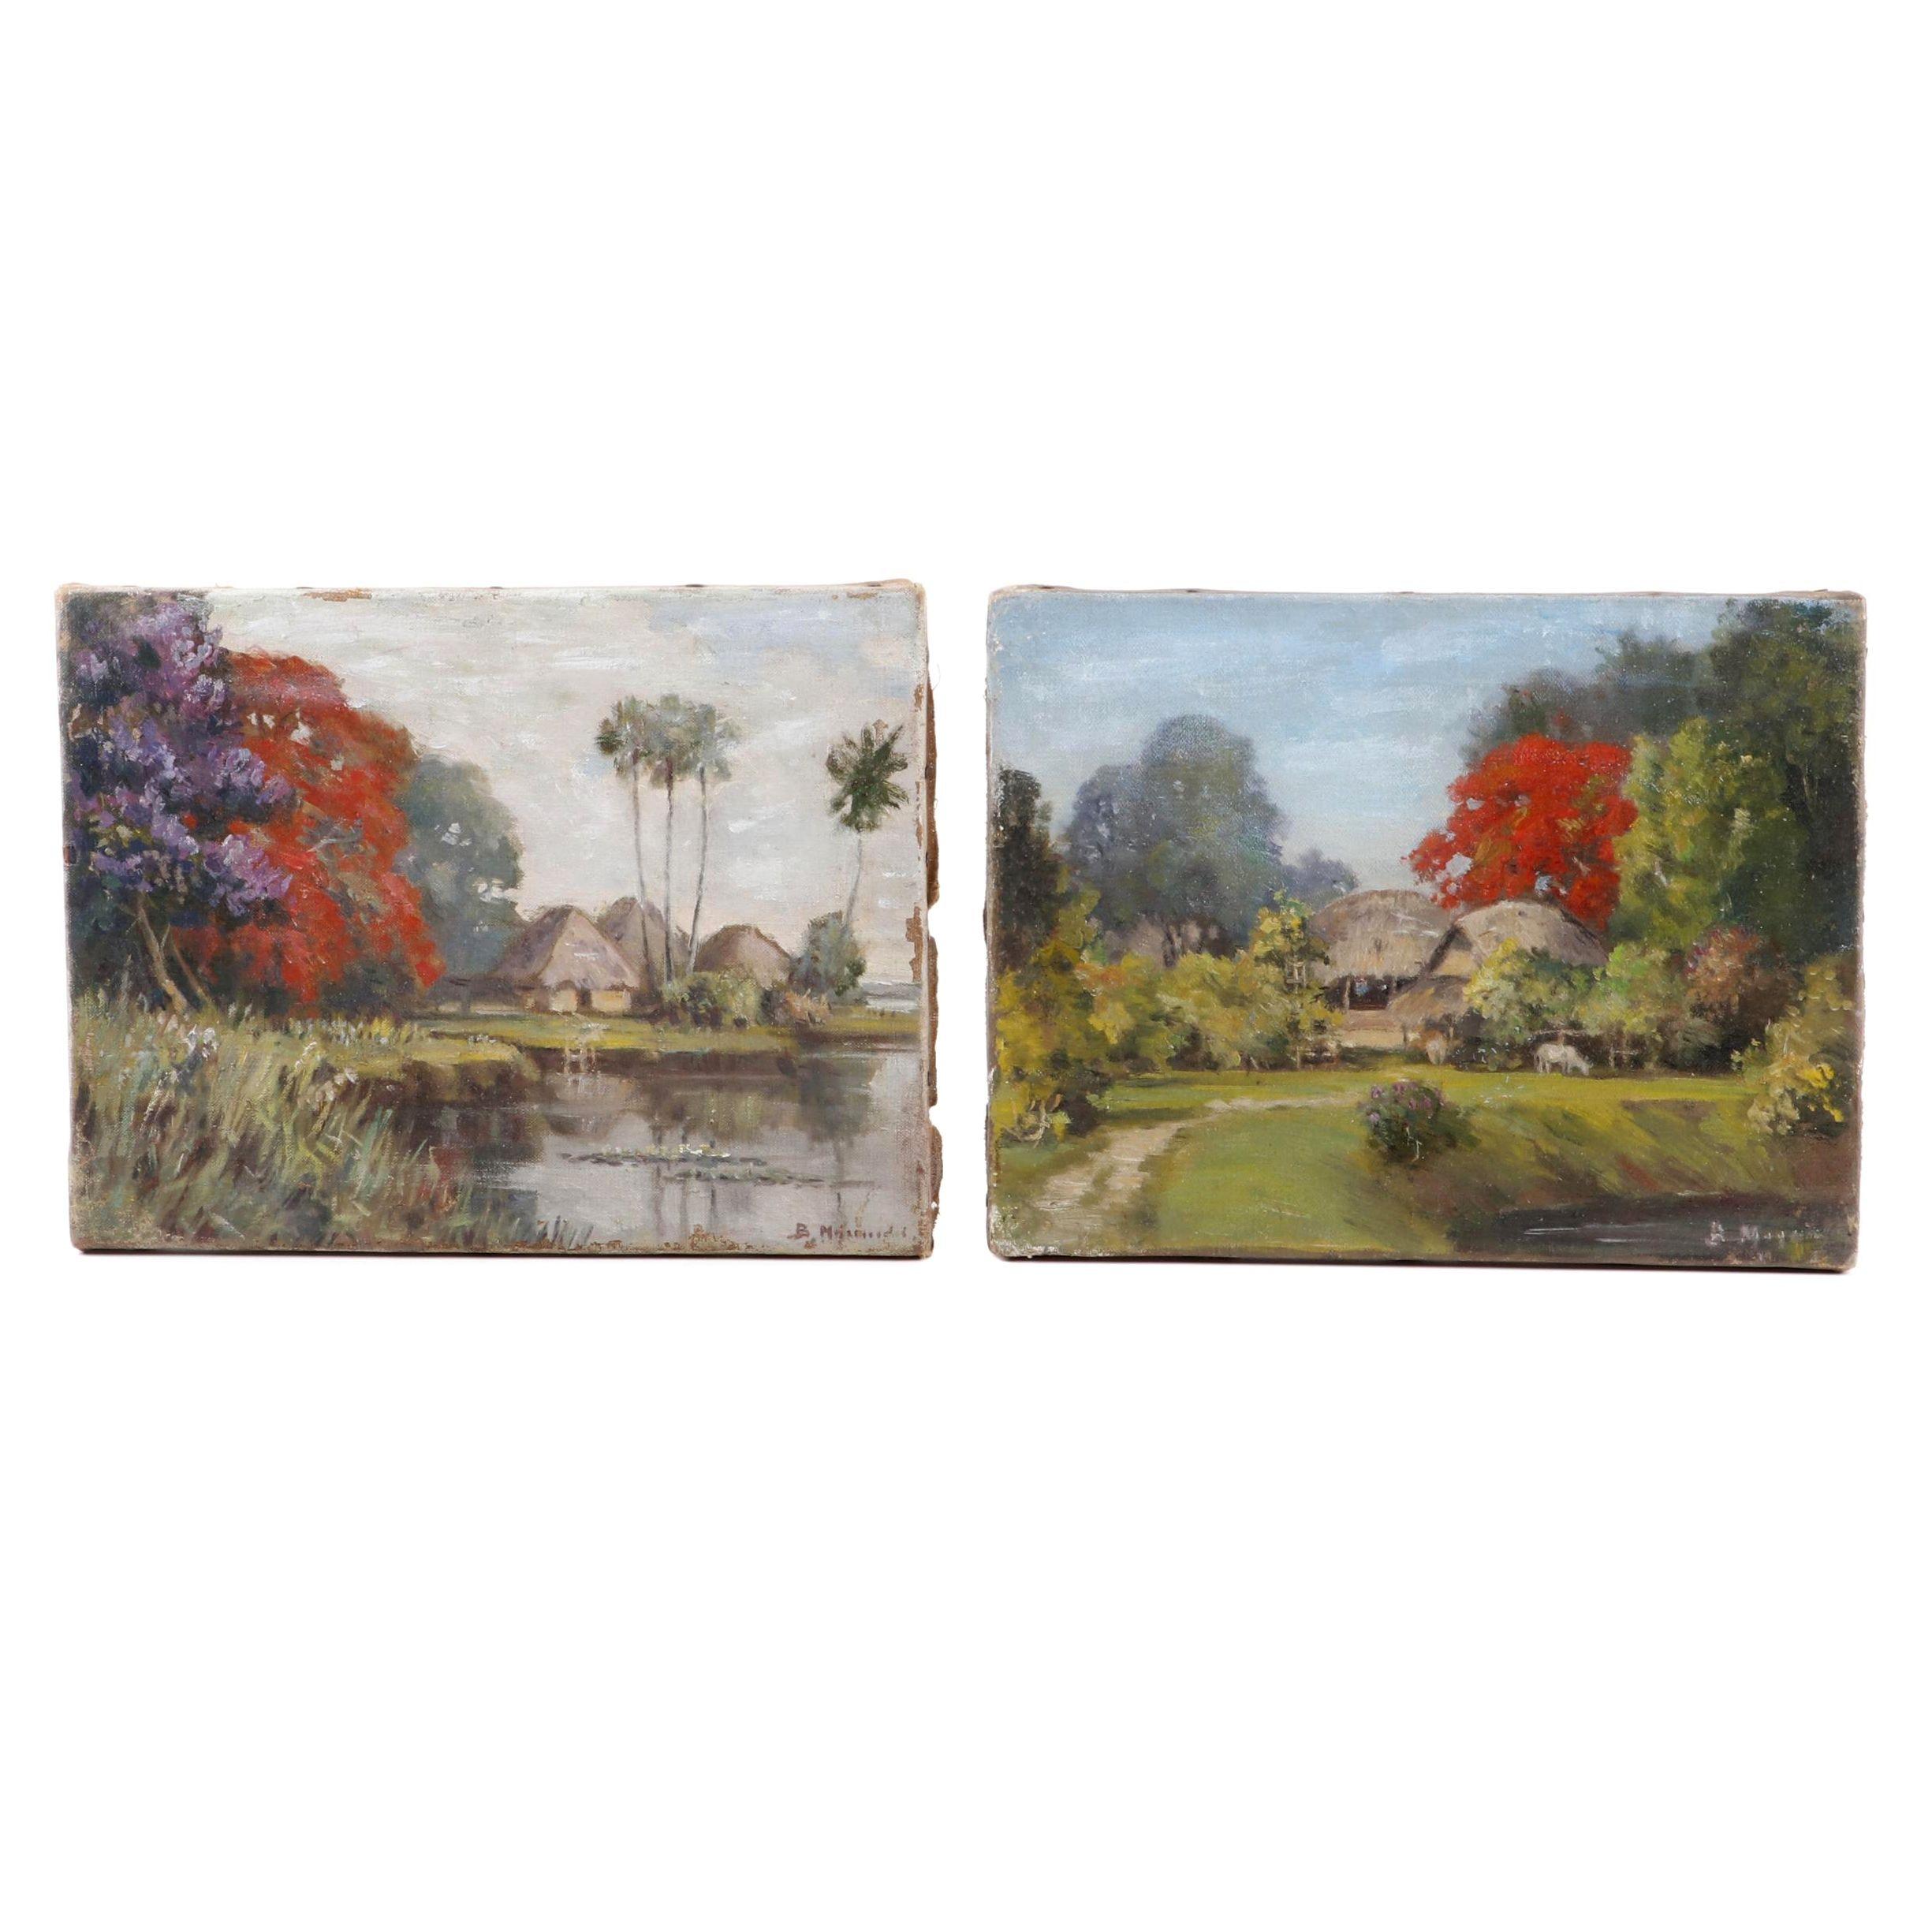 B. Majumdar Indian/Bangladeshi Landscape Oil Paintings